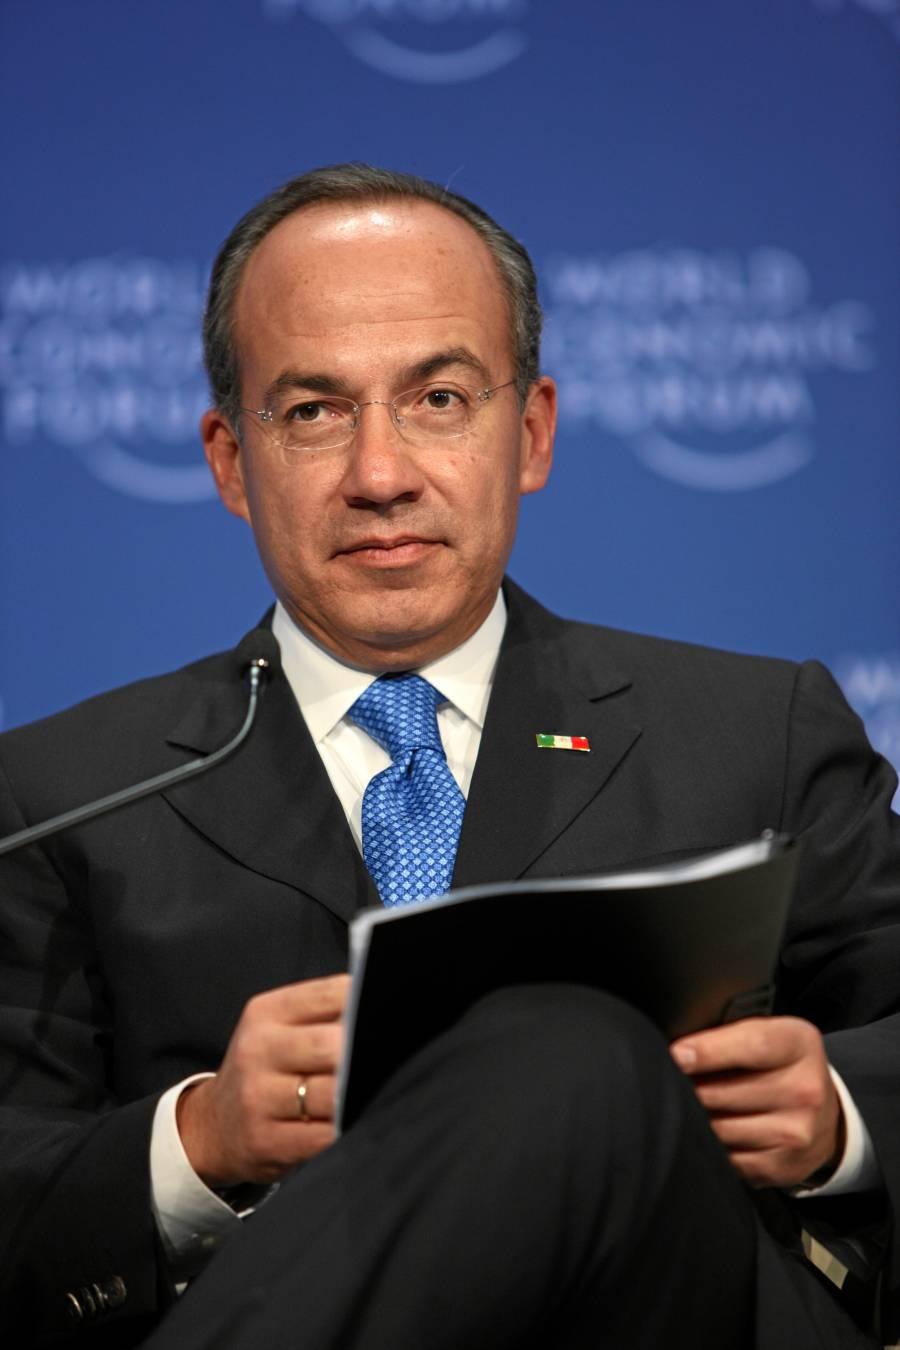 Calderón desconoce documentos sobre BOA presentados por AMLO